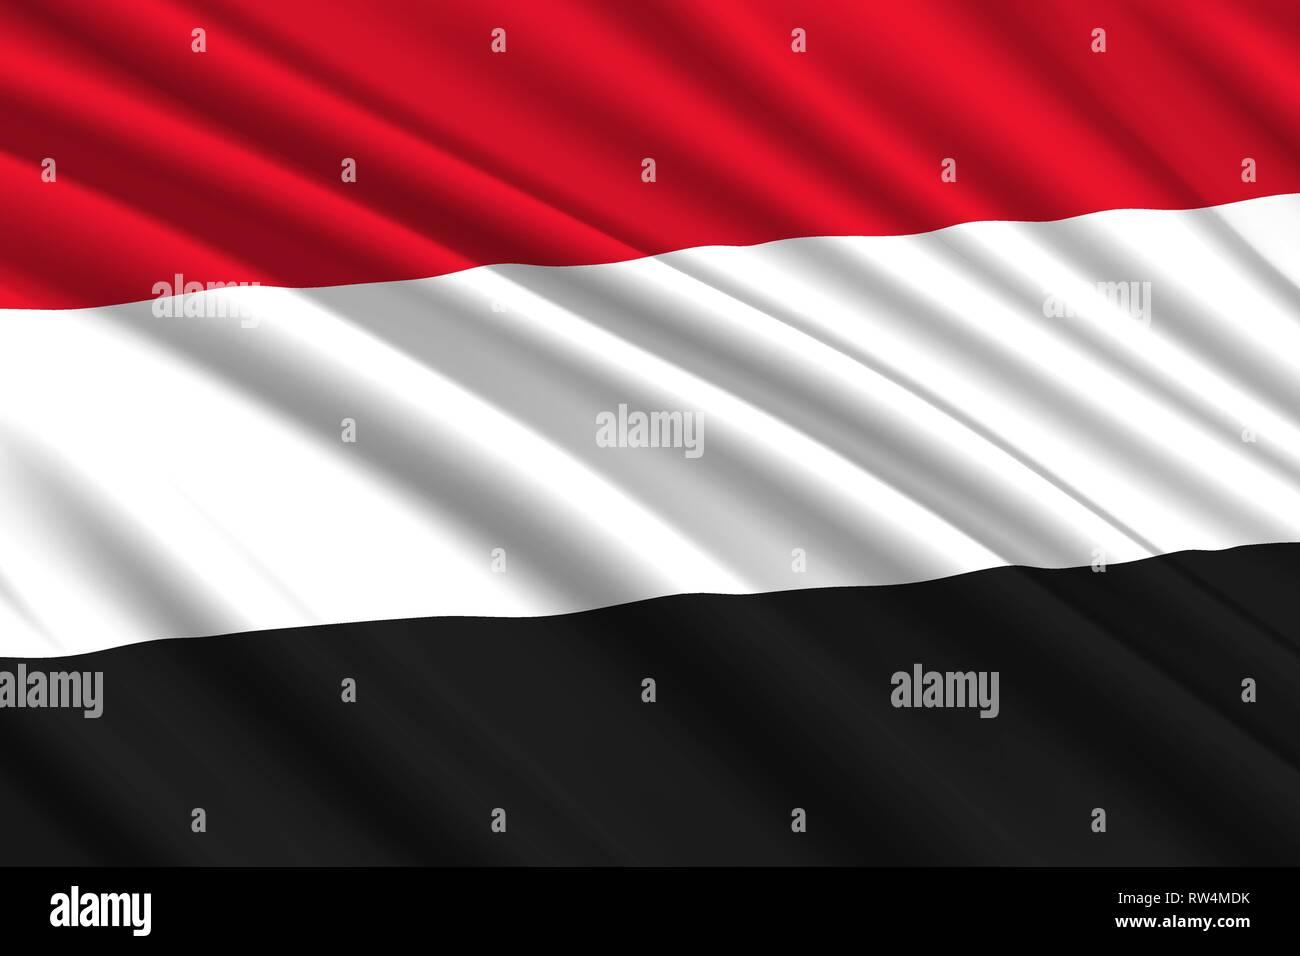 waving flag of Yemen. Vector illustration - Stock Vector